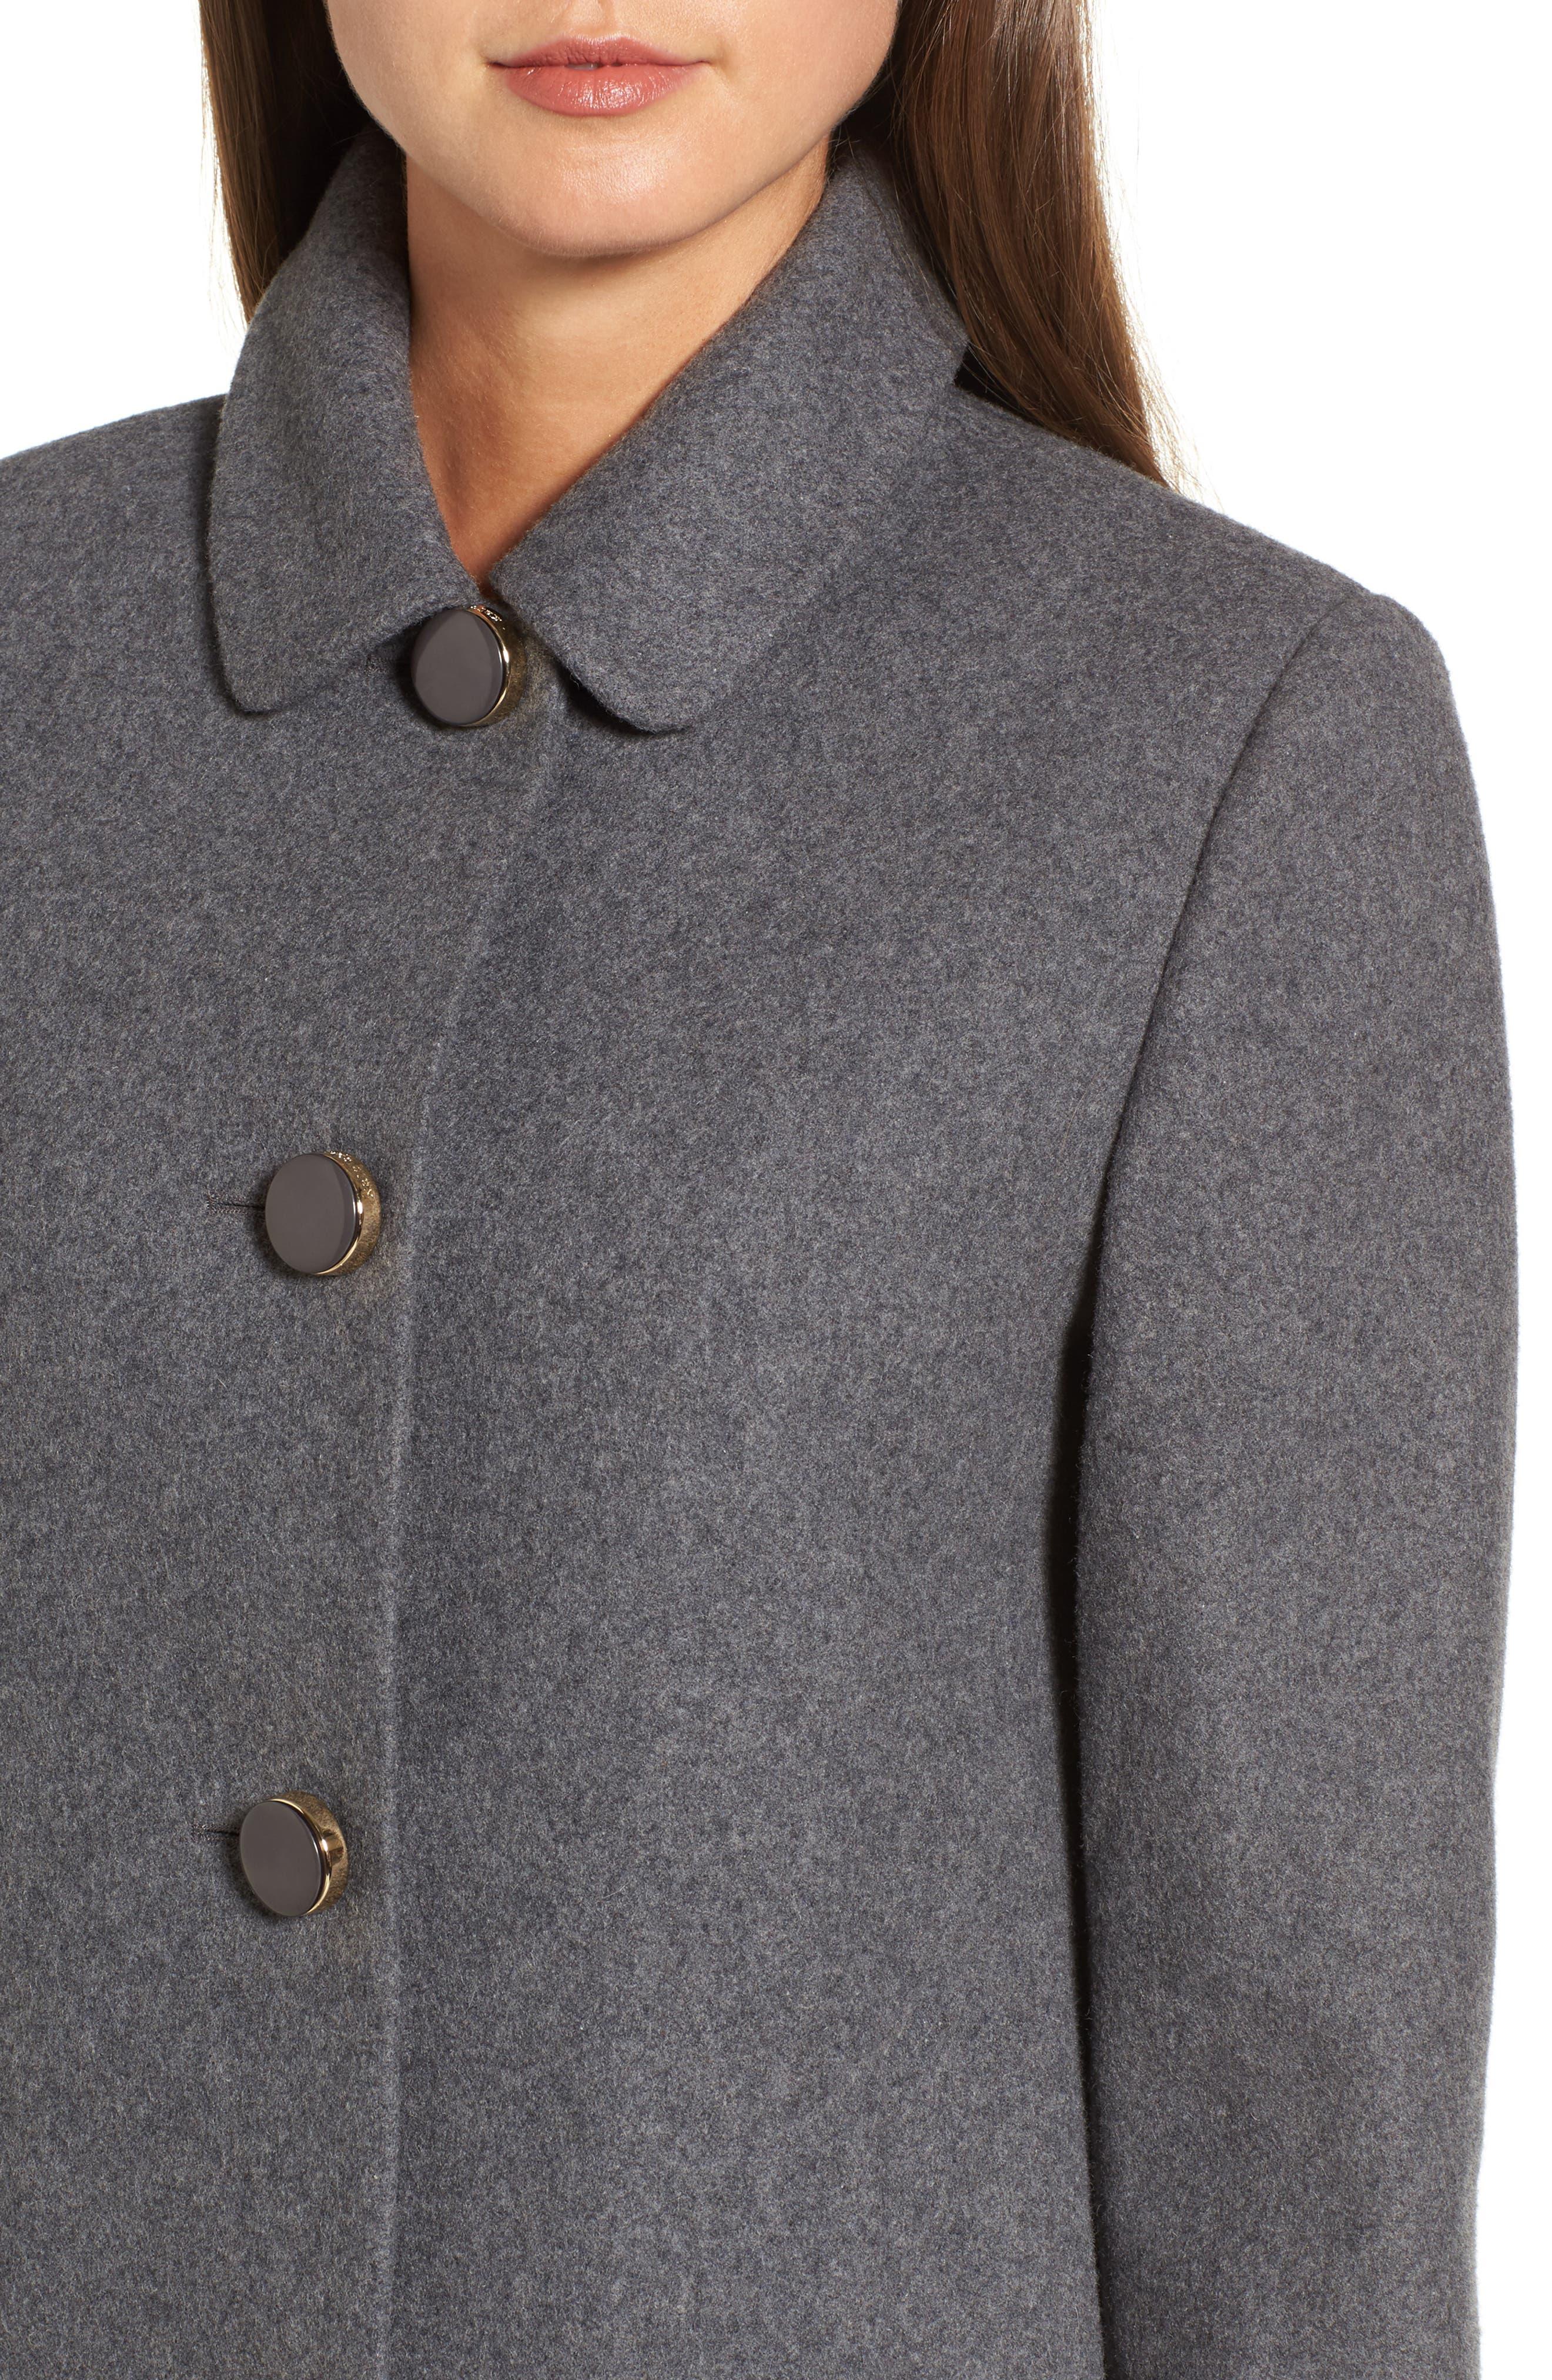 drop waist wool blend flounce coat,                             Alternate thumbnail 4, color,                             Soft Grey/ Light Grey